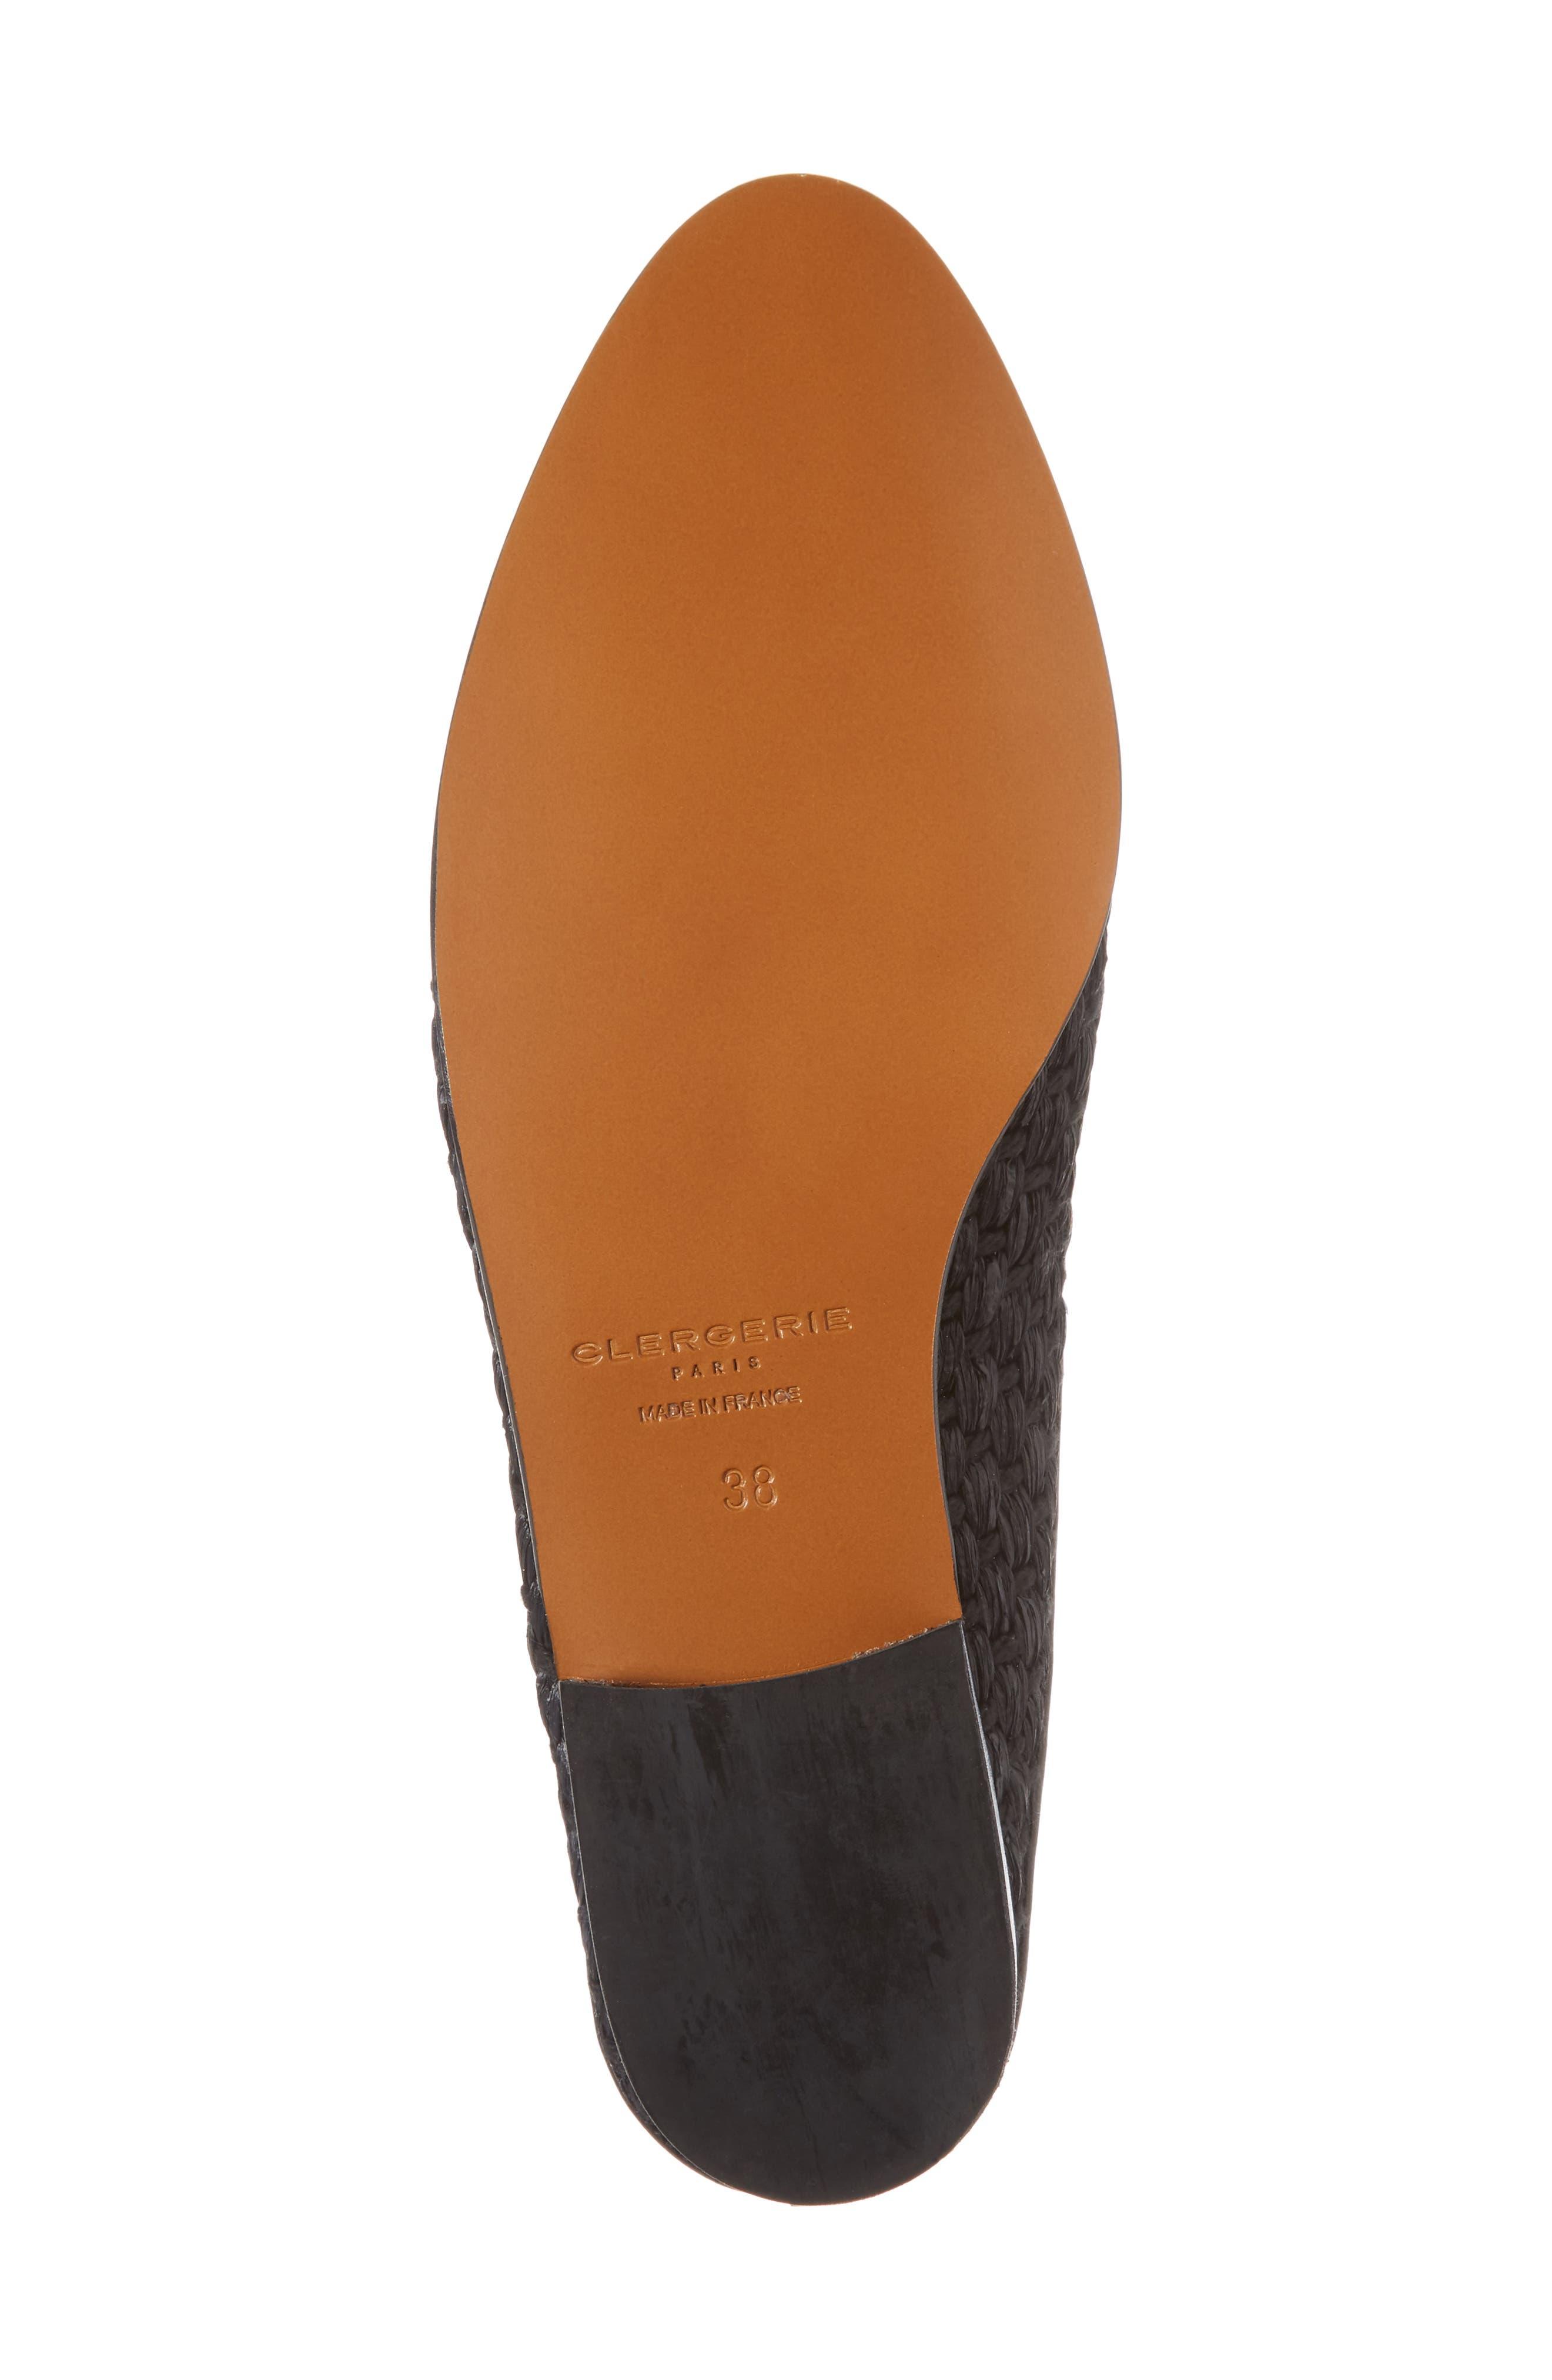 Aliceop Woven Loafer Mule,                             Alternate thumbnail 6, color,                             Black